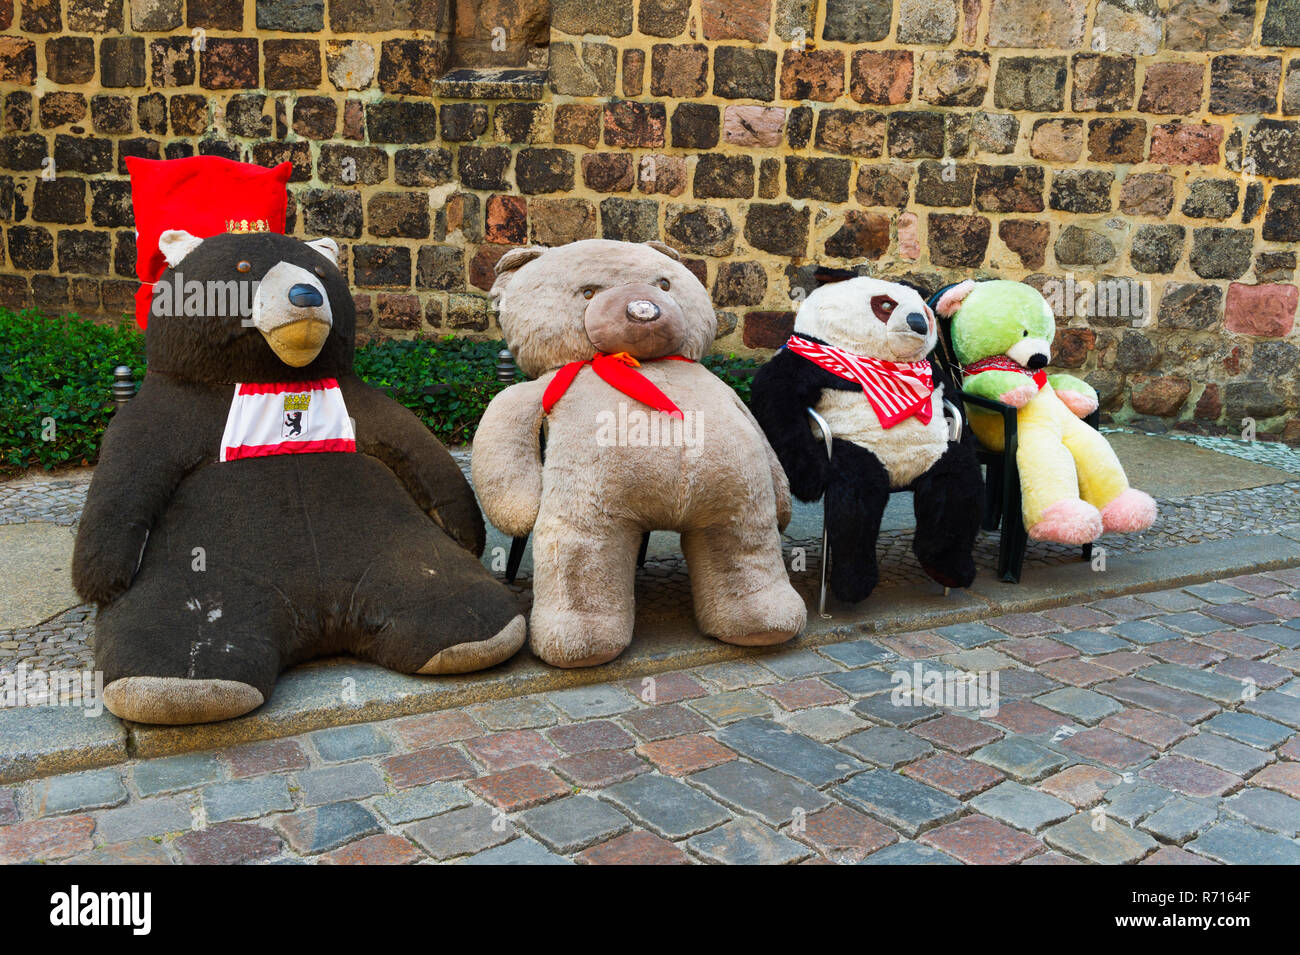 Pilot teddy bear | Etsy